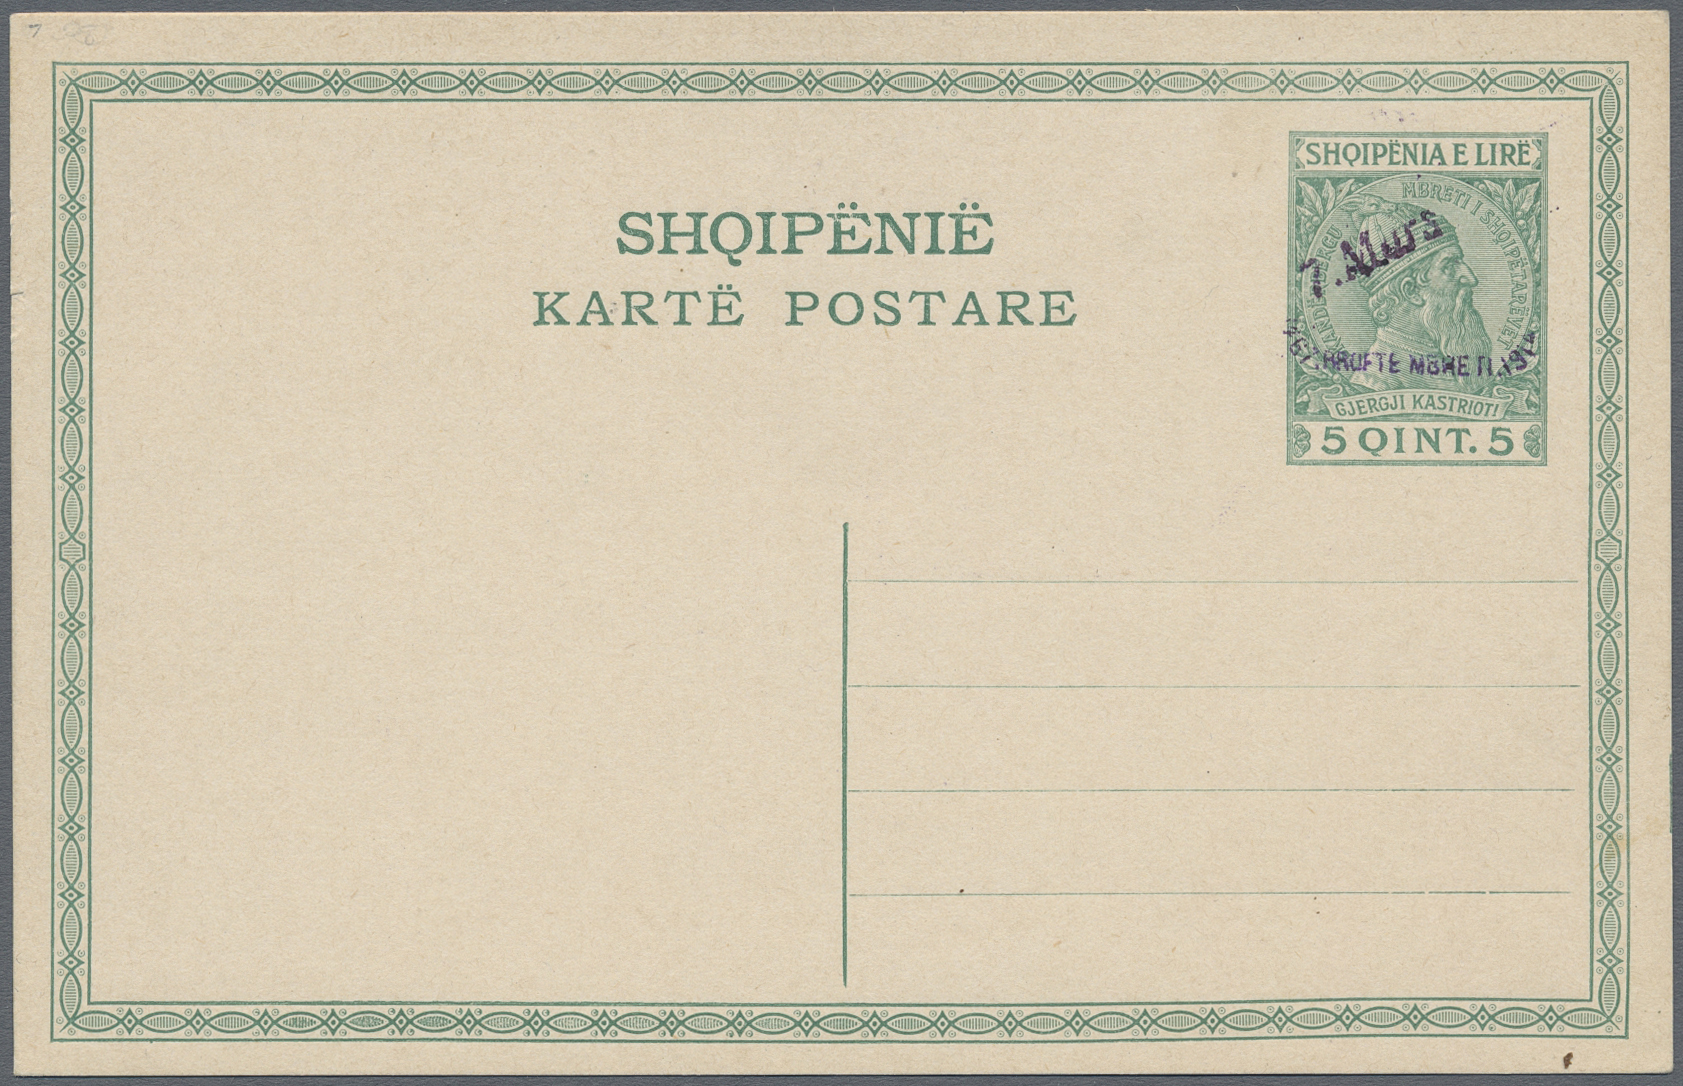 Lot 15560 - Albanien - Ganzsachen  -  Auktionshaus Christoph Gärtner GmbH & Co. KG Single lots Philately Overseas & Europe. Auction #39 Day 4